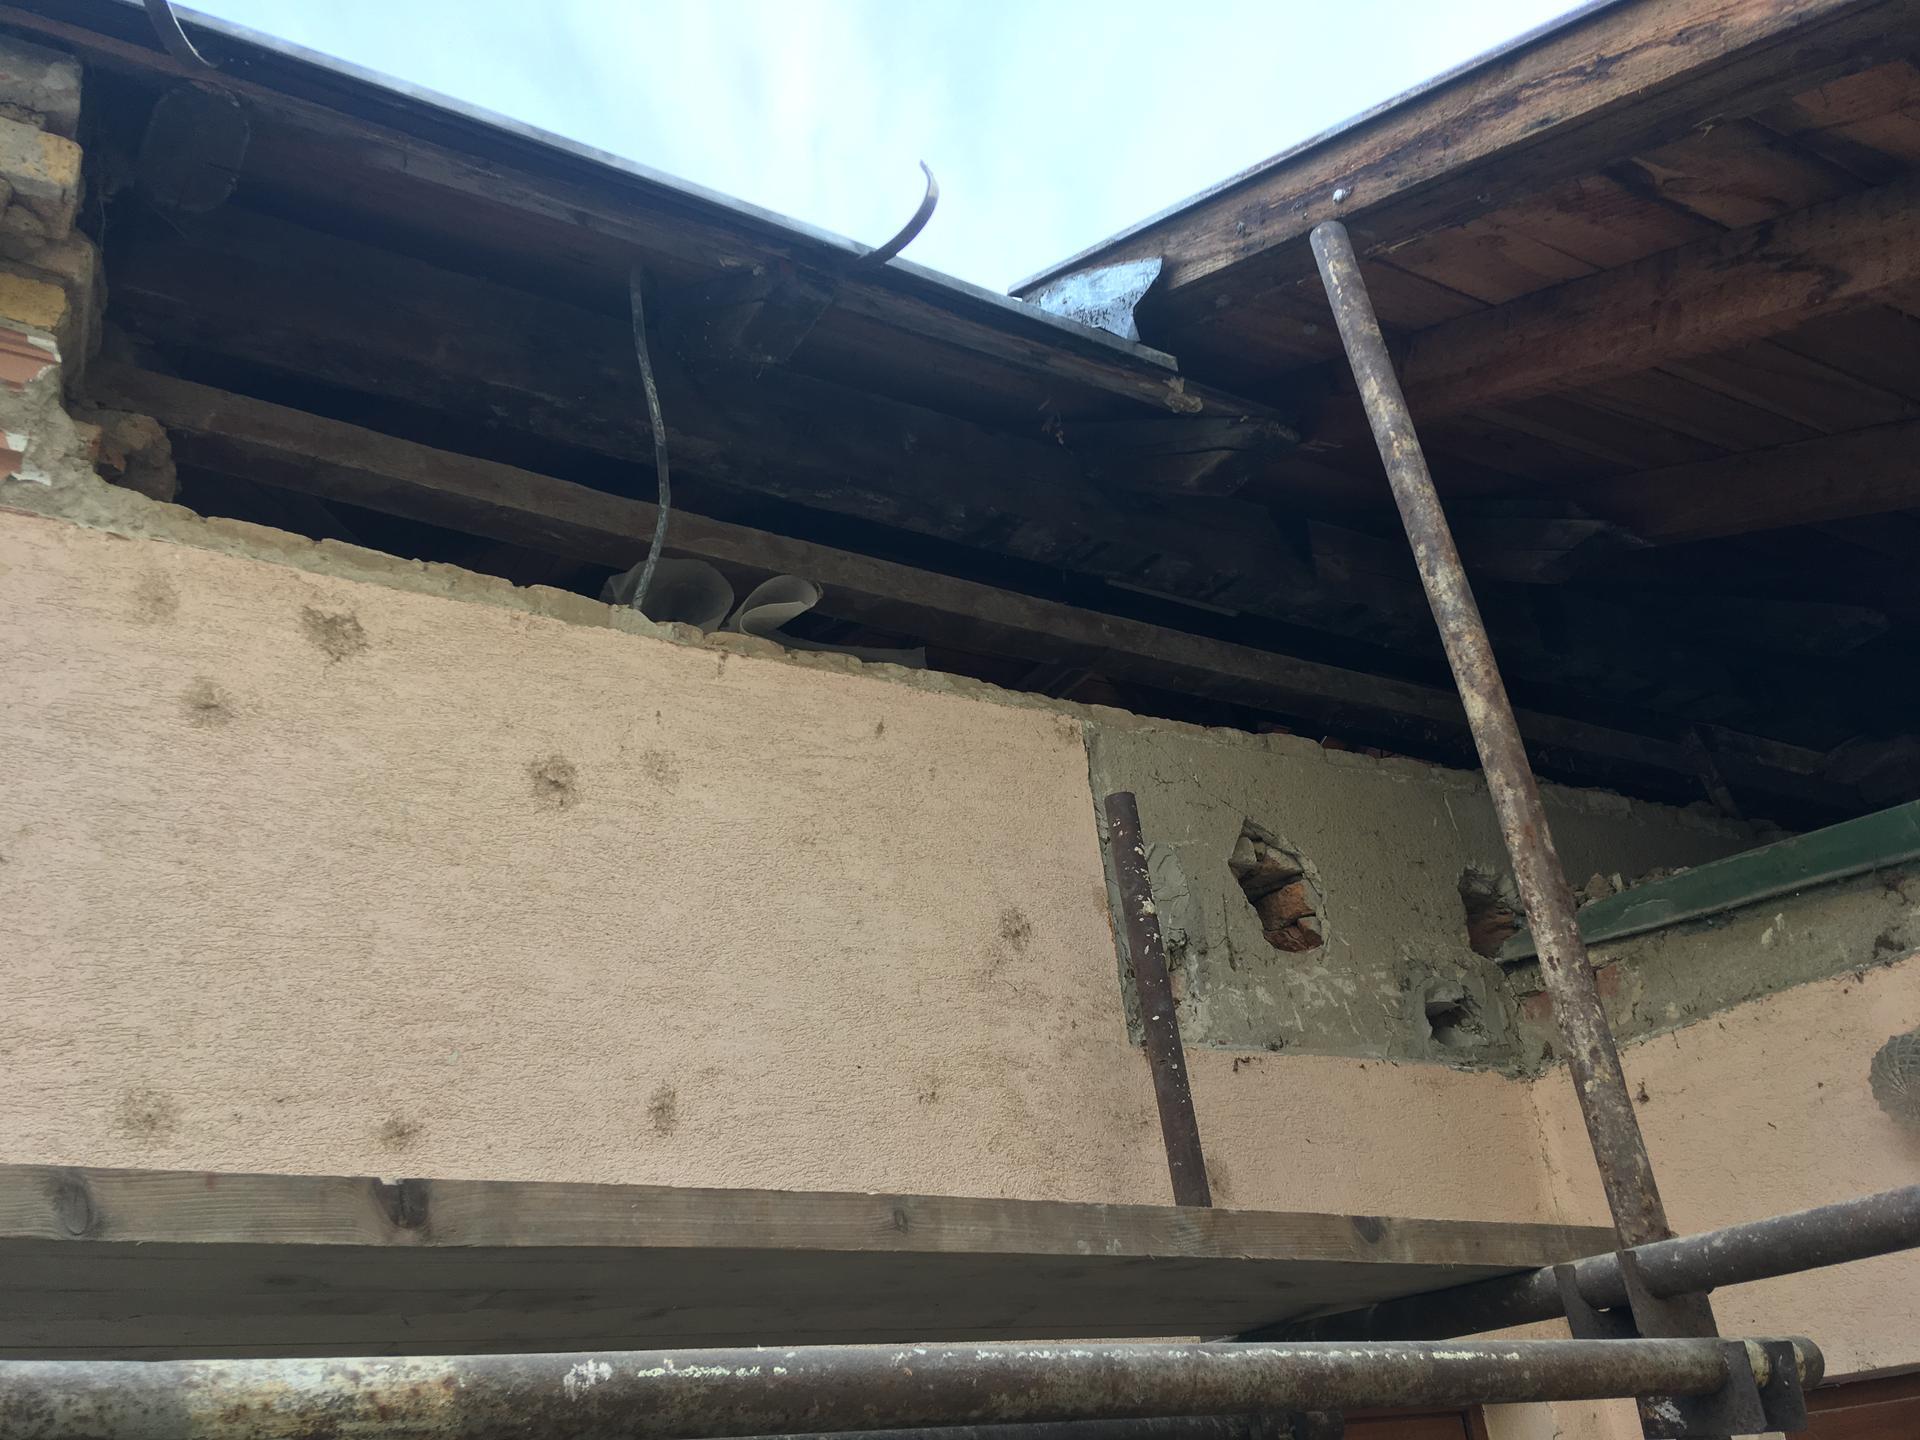 Prestavba podkrovia zo sedlovo valbovej na sedlovú strechu. - Obrázok č. 61